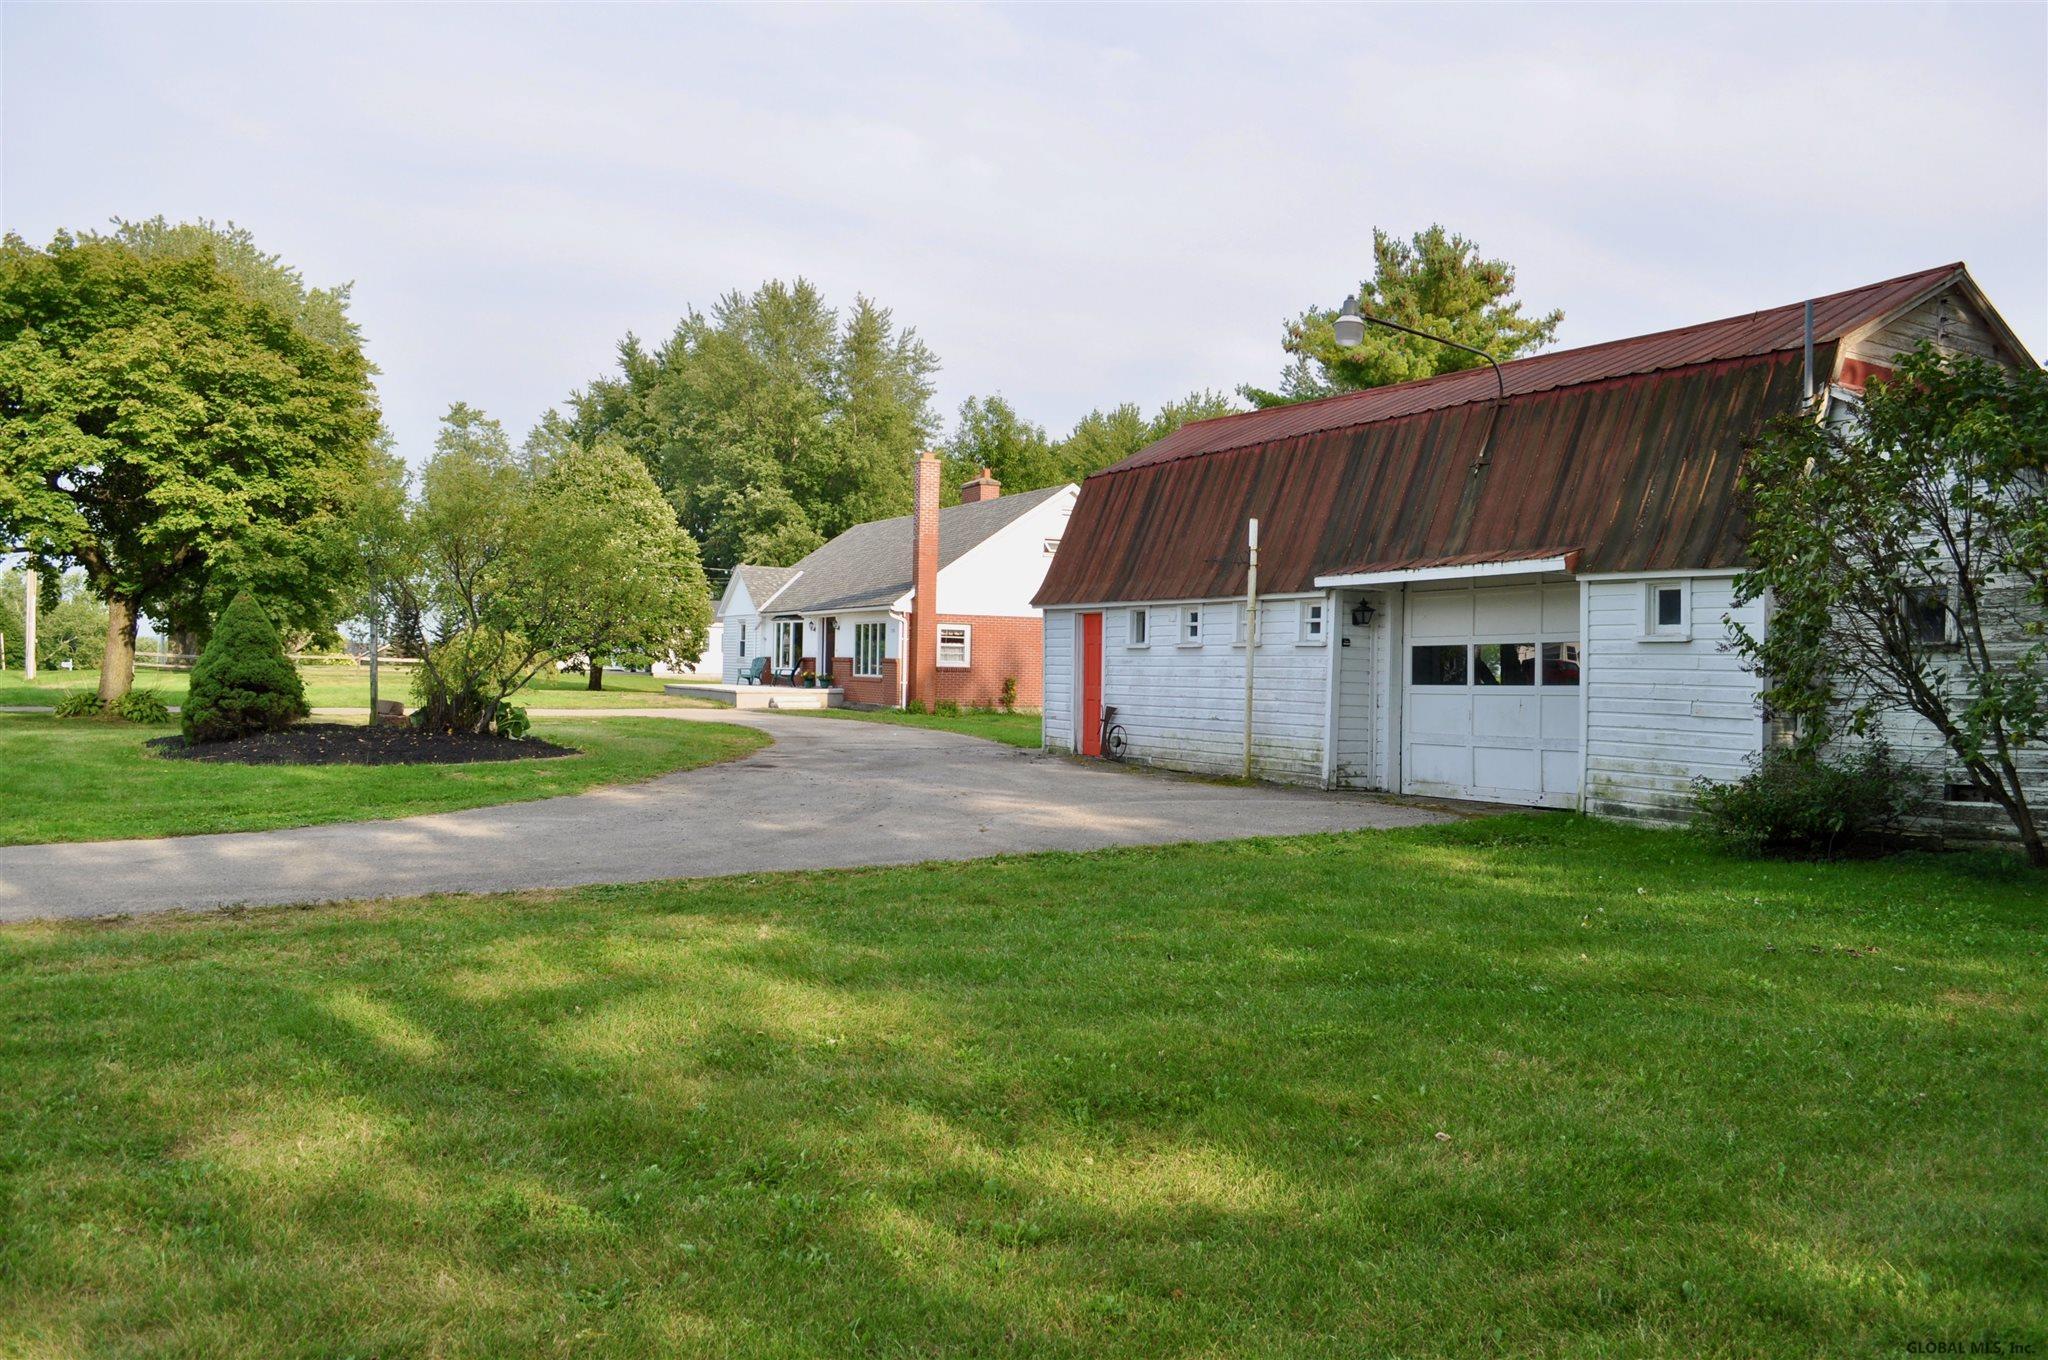 Johnstown image 91